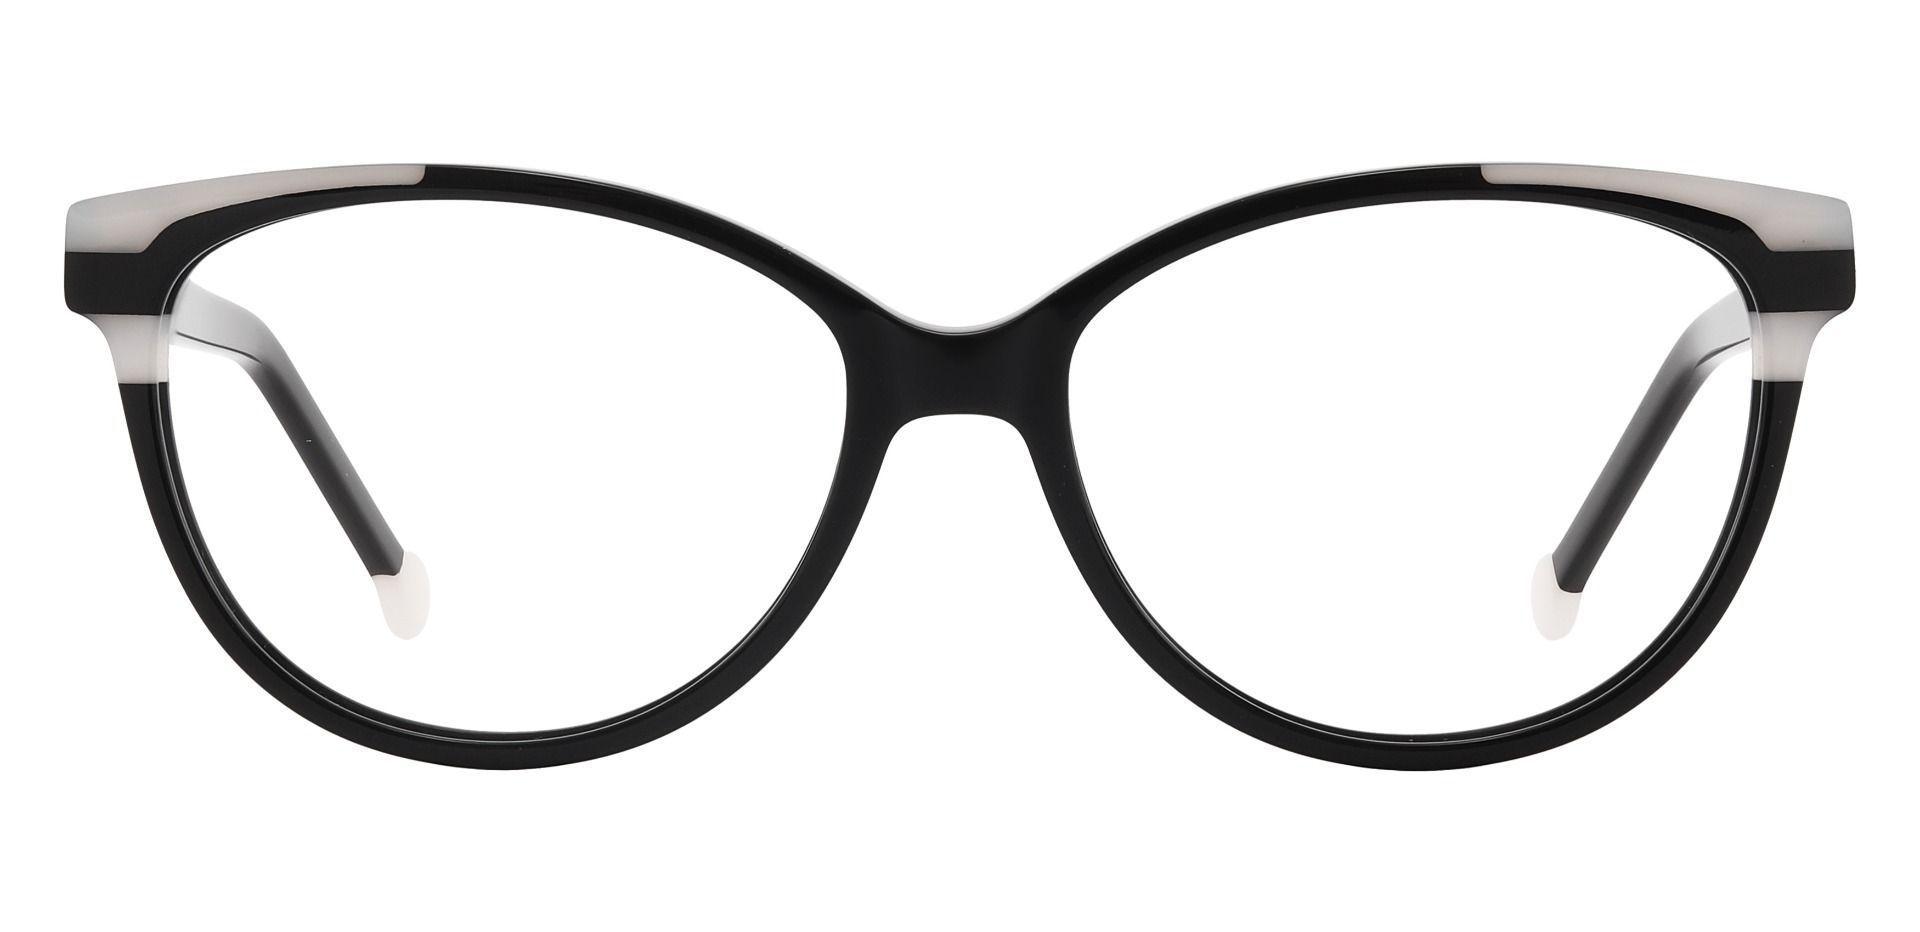 Wisdom Cat Eye Prescription Glasses - Black